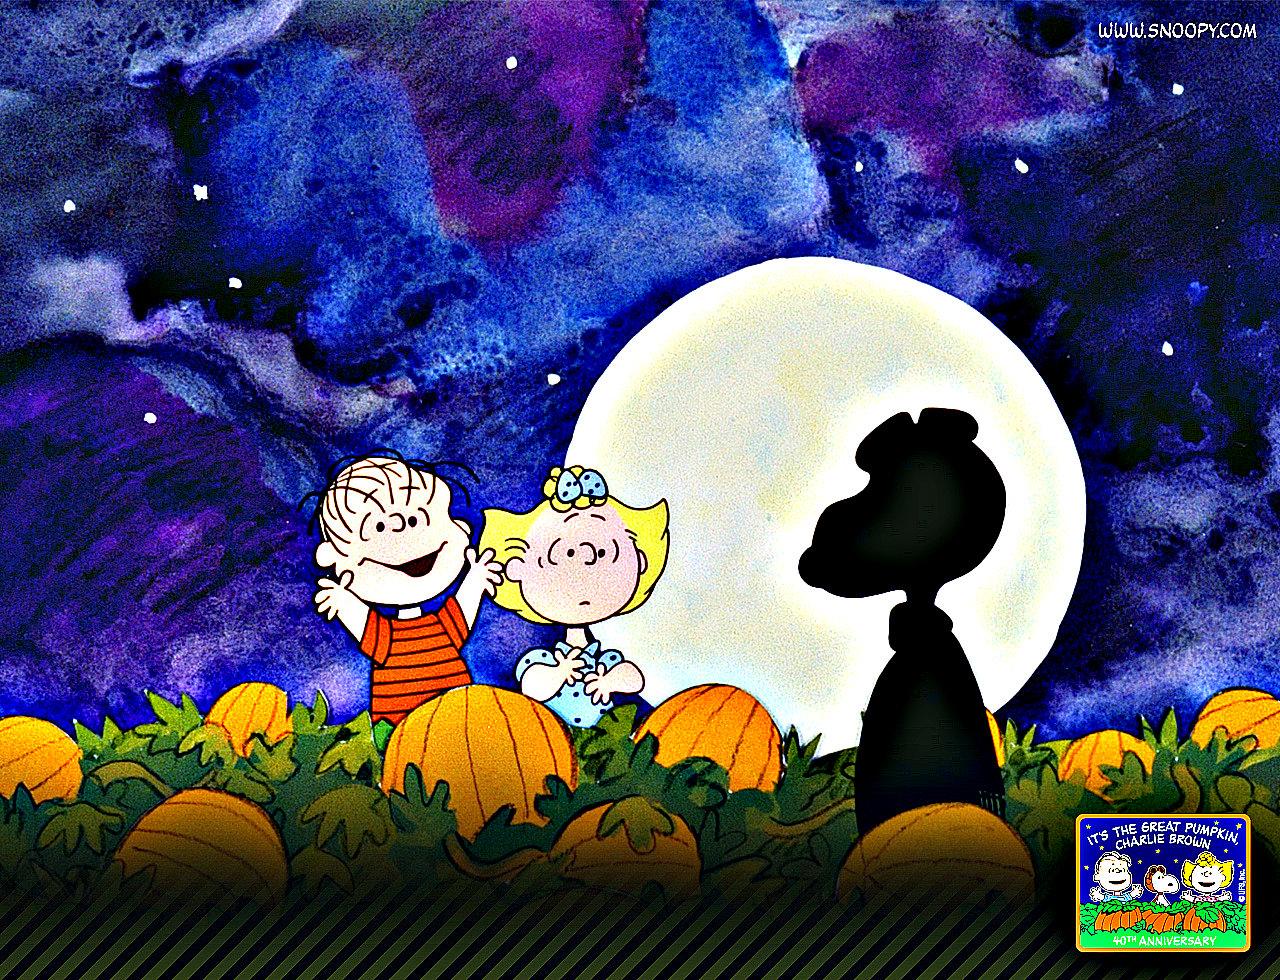 Great Pumpkin Charlie Brown Halloween